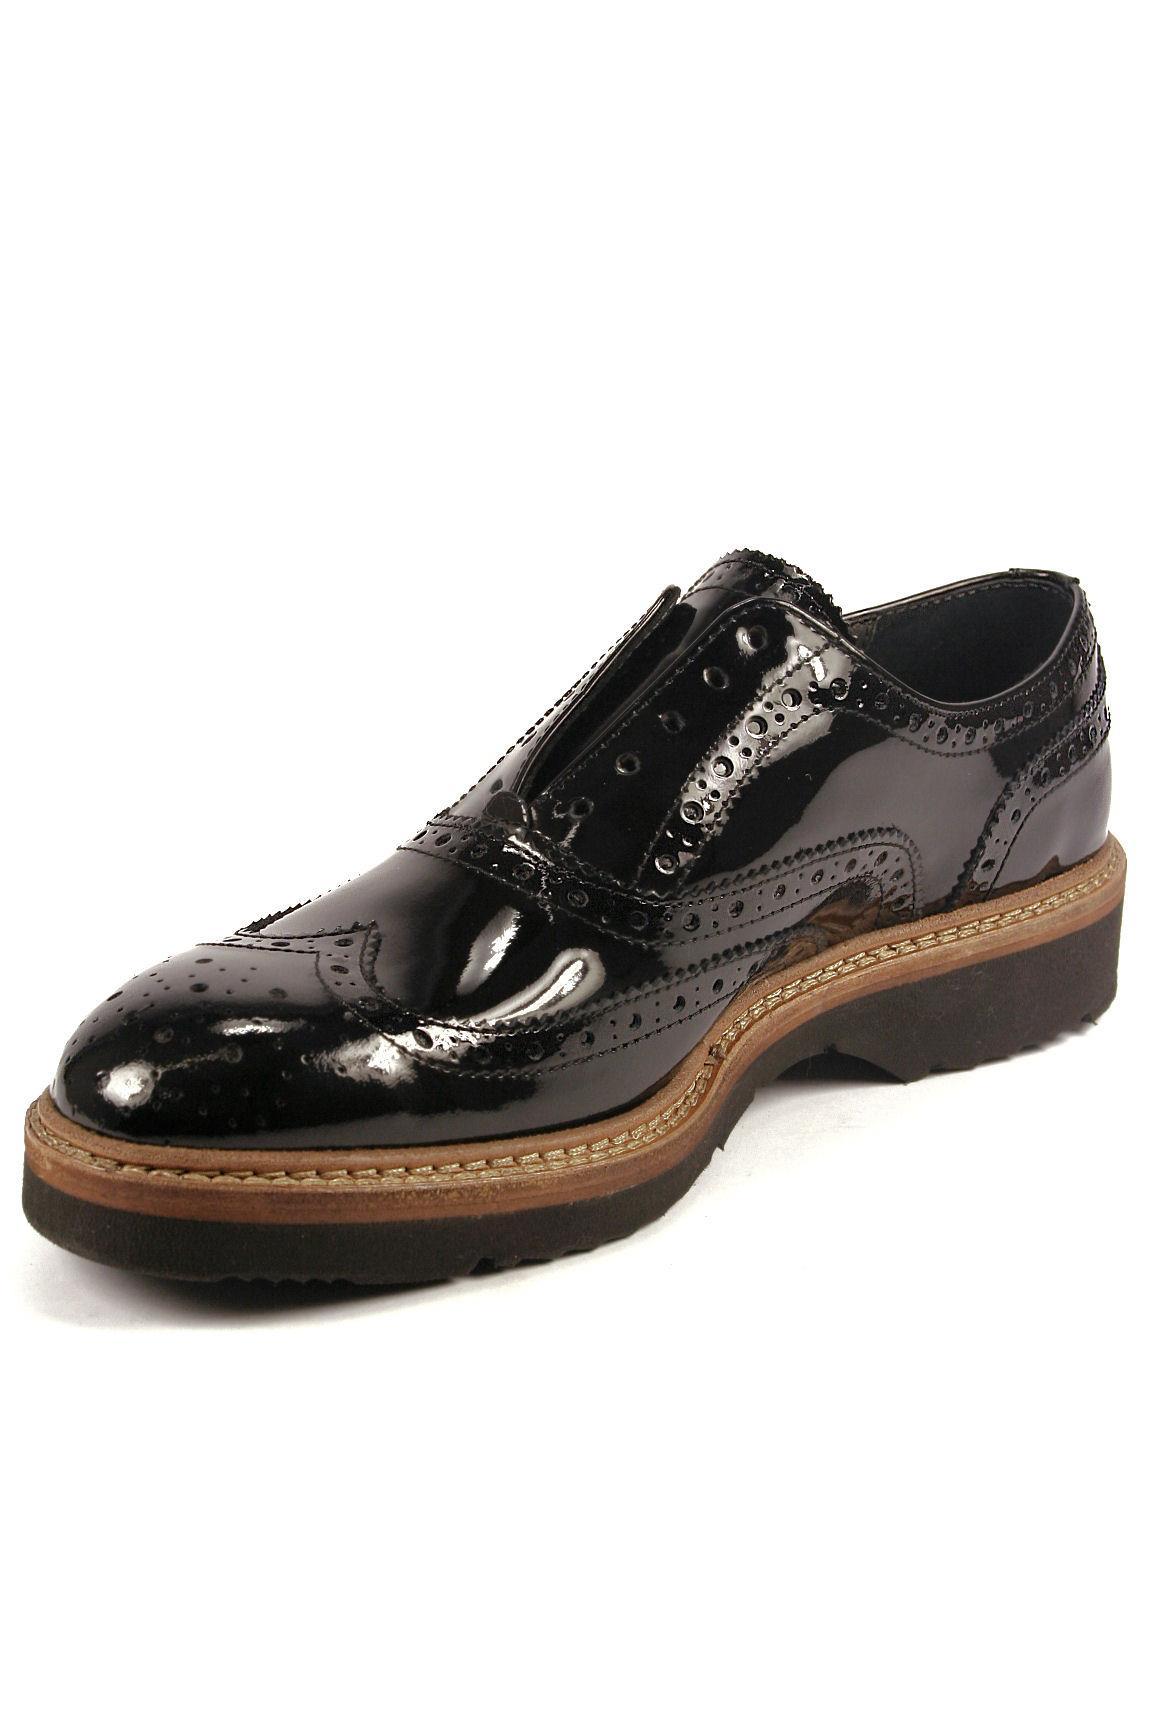 best website 2dbca 7d218 scarpe wexford